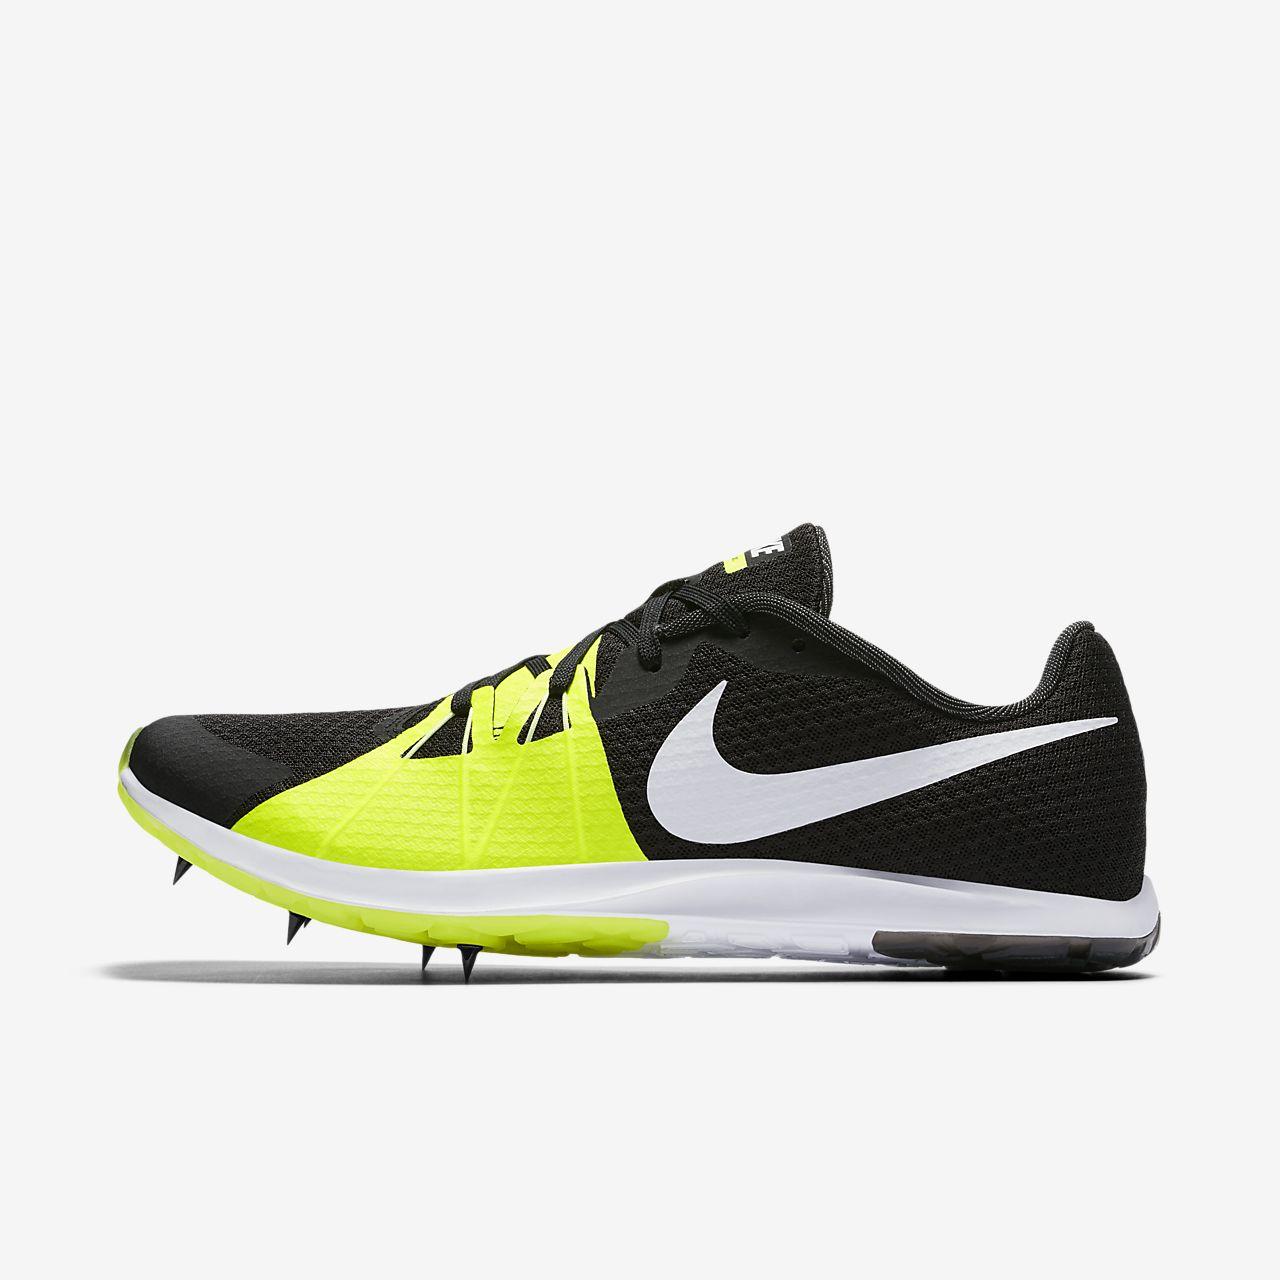 ... Chaussure d'athlétisme mixte Nike Zoom Rival XC